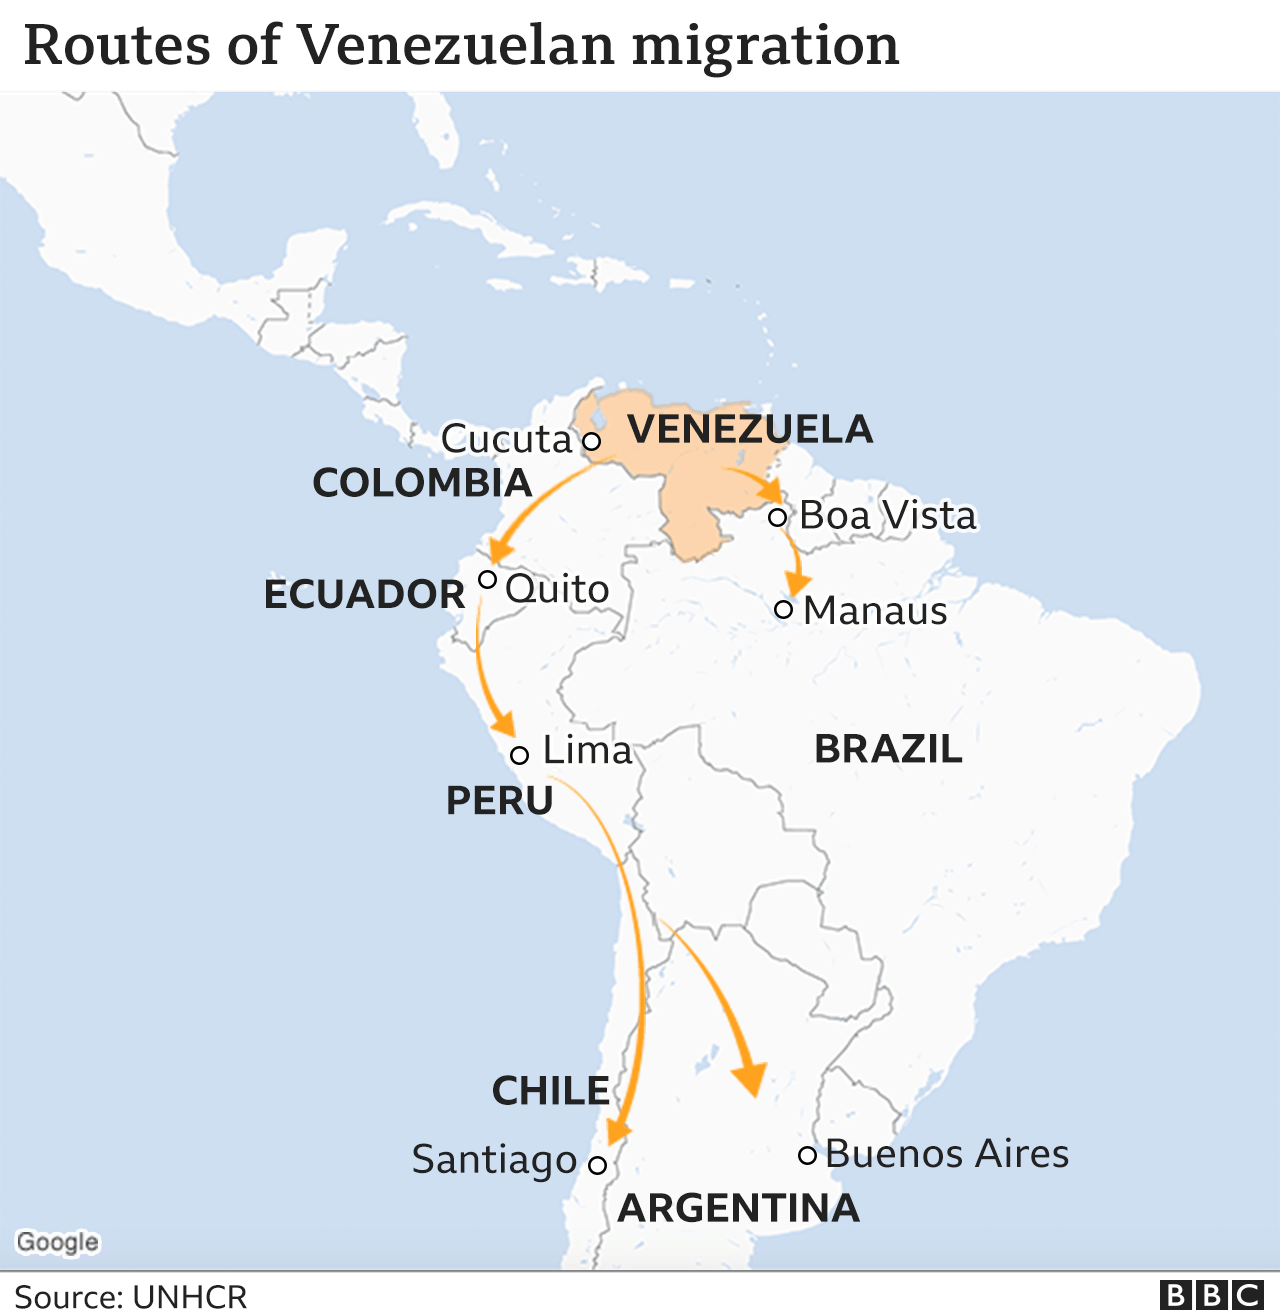 Map showing the routes of Venezuelan migration